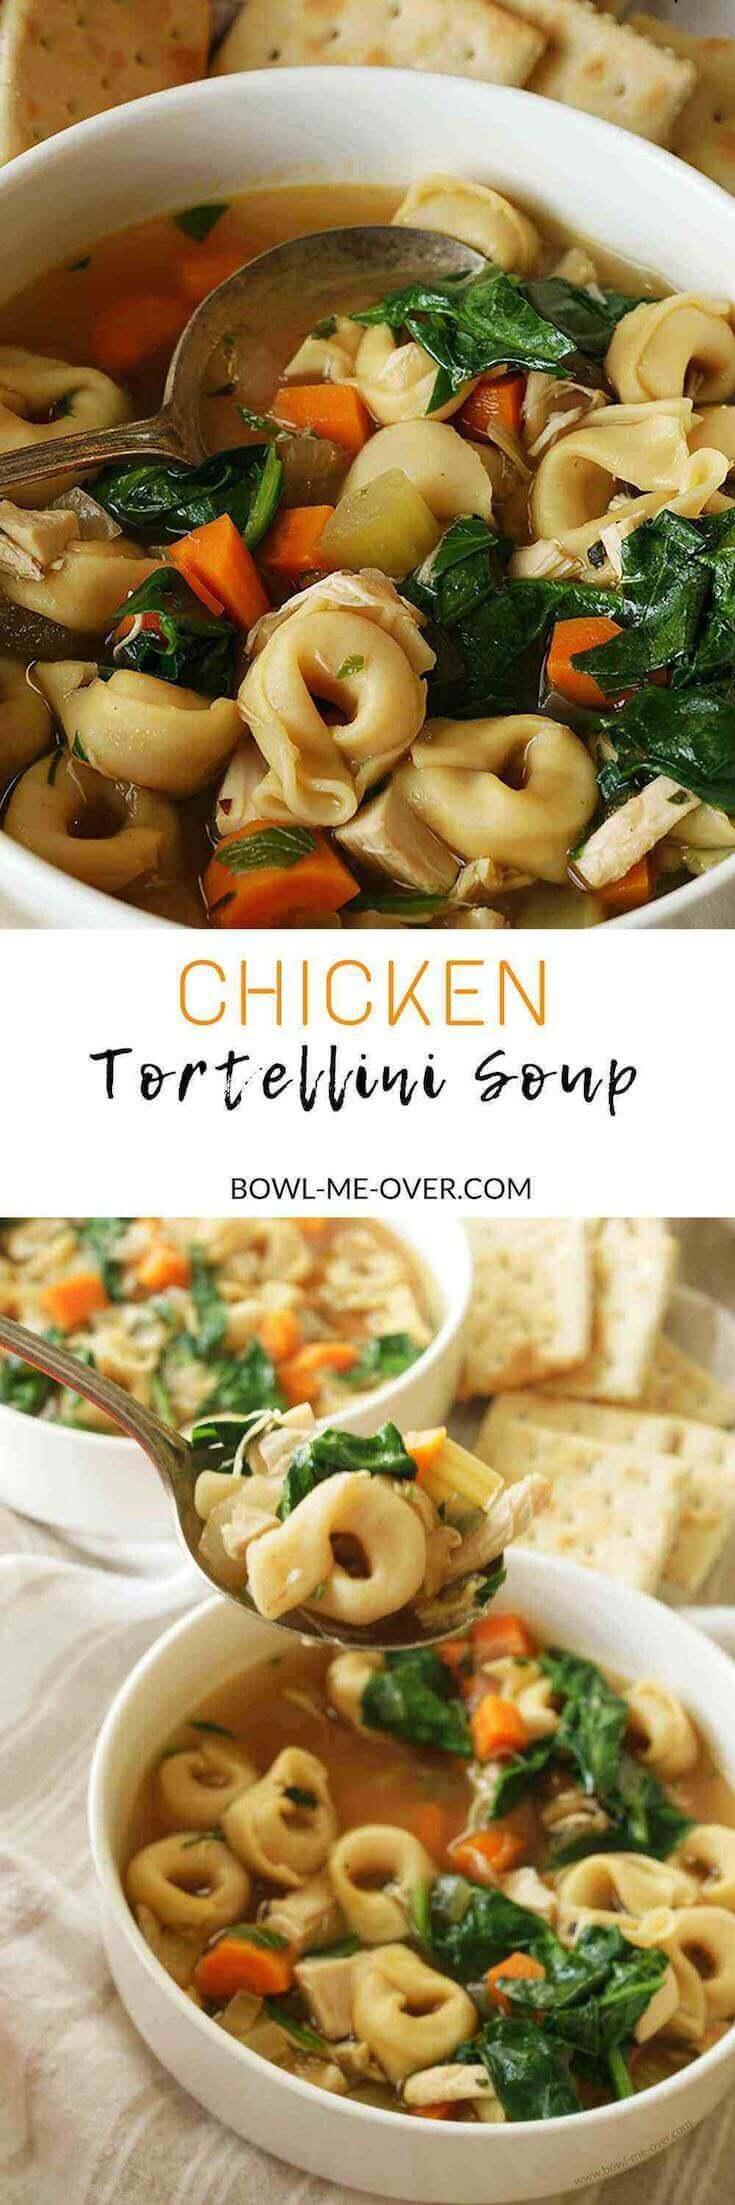 30 Minute Chicken Tortellini Soup